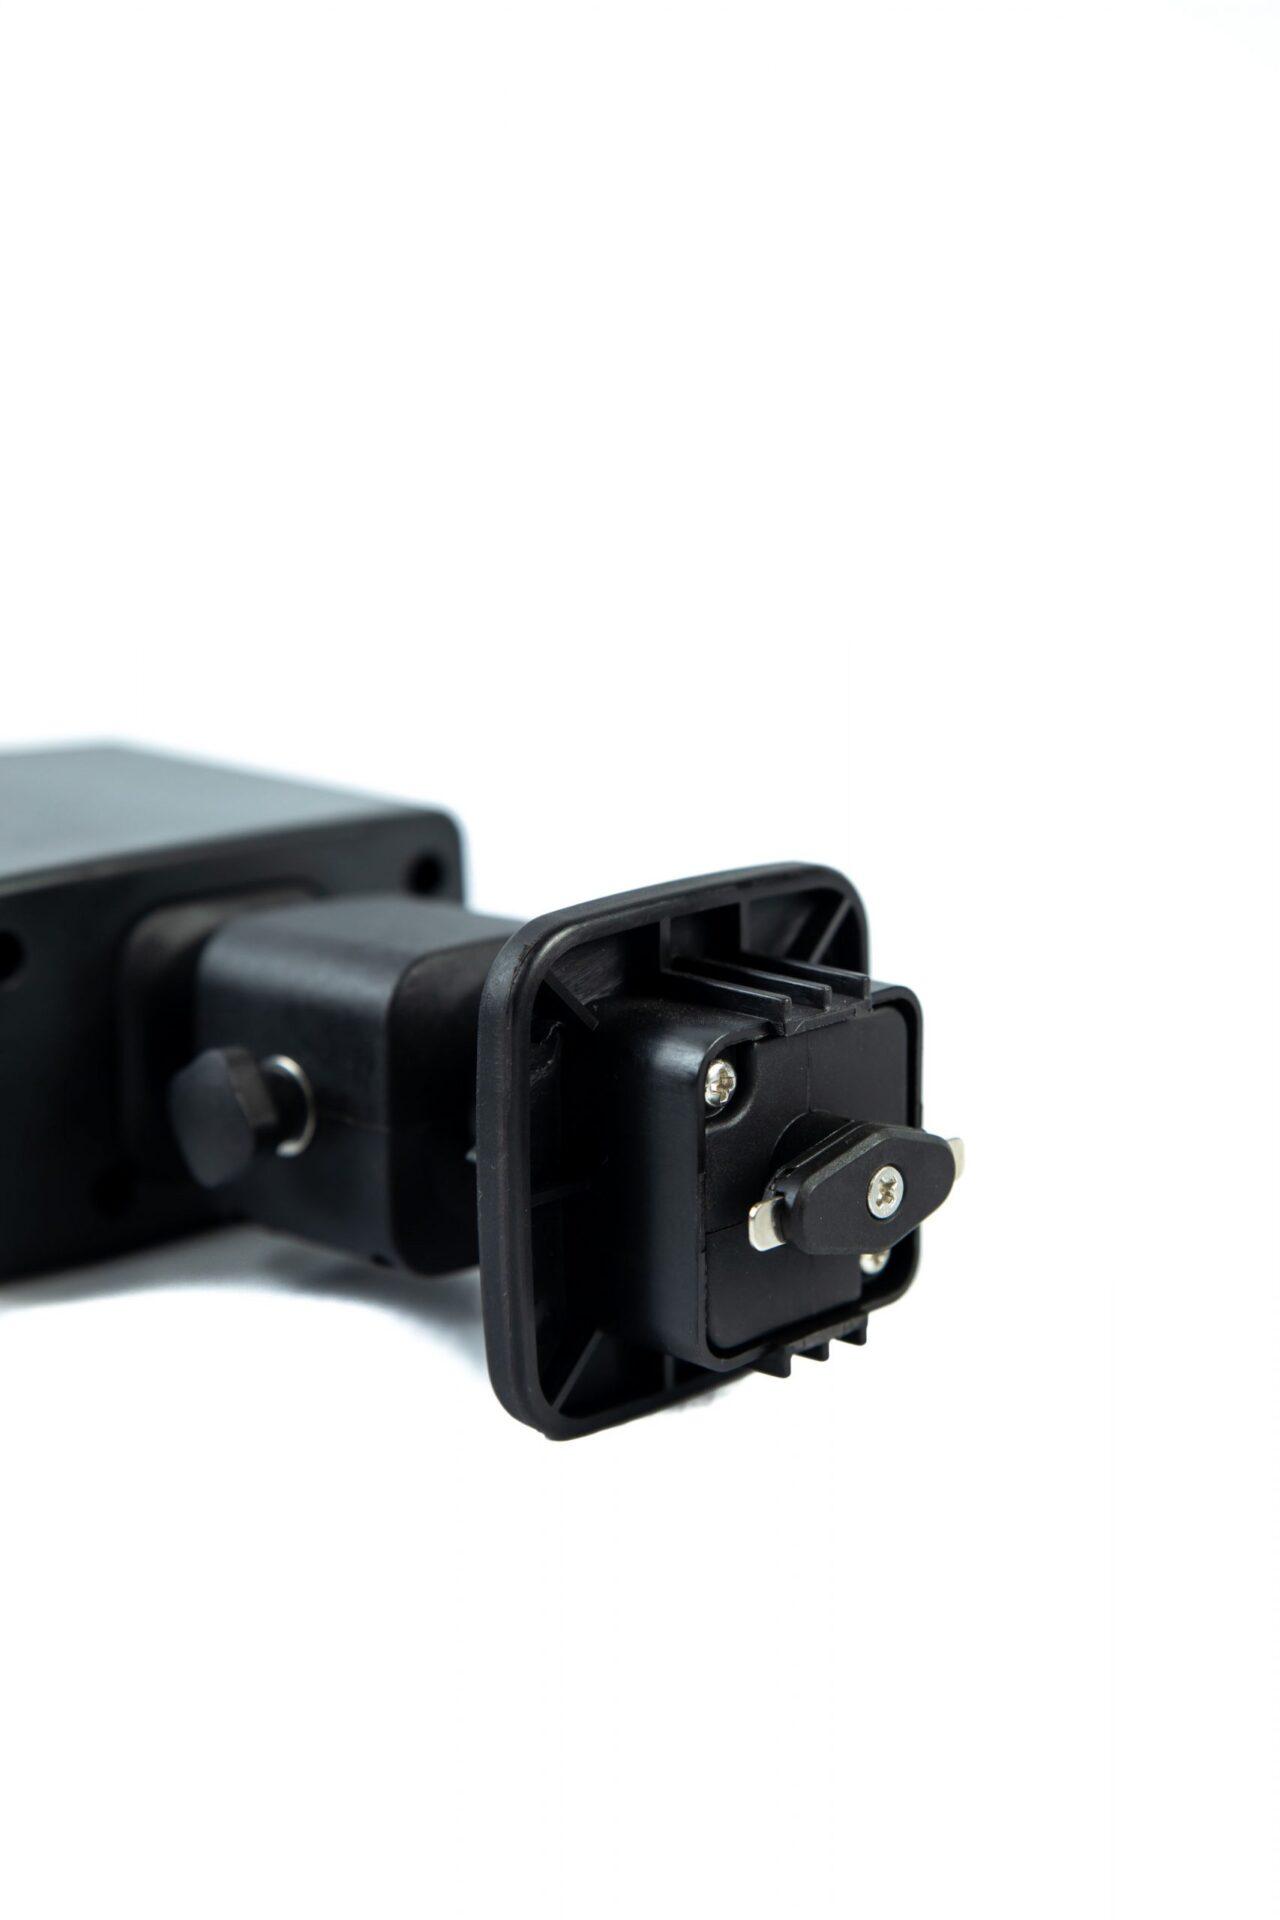 black plastic mounting device